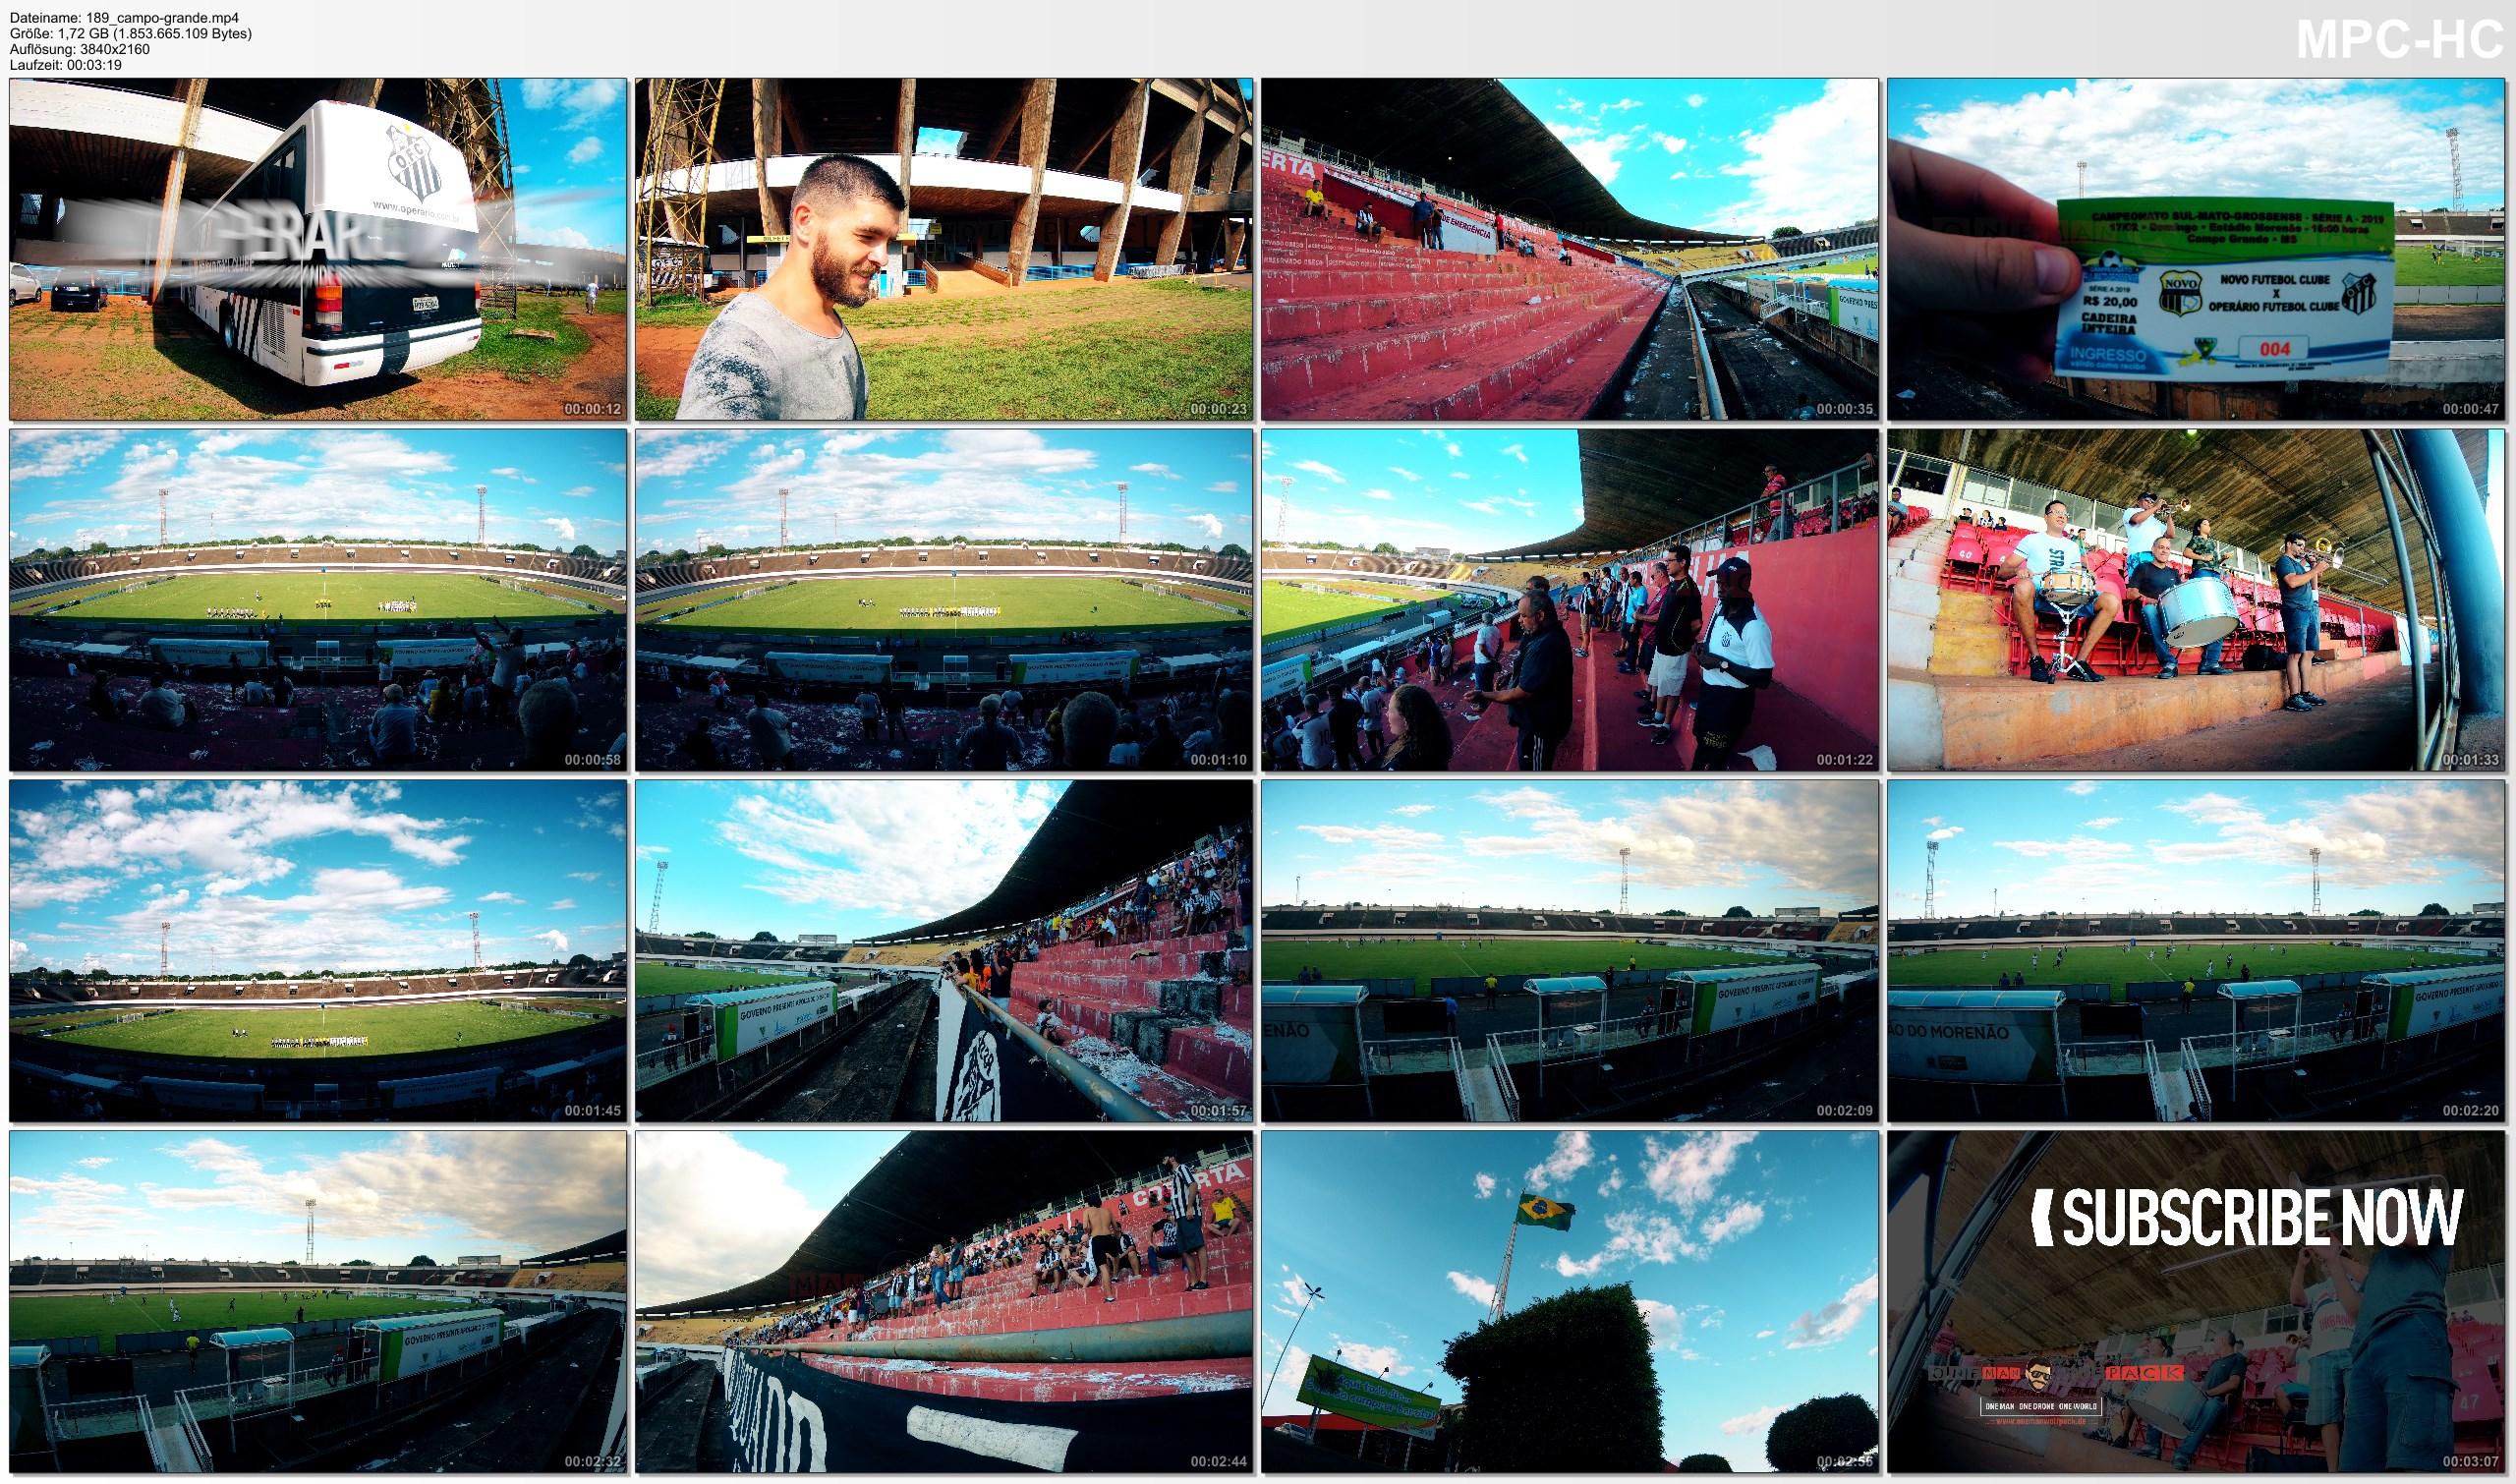 Pictures from Video 【4K】Groundhopping Footage   NOVOPERARIO x OPERARIO 0x2 ..:: Estadio Morenao Campo Grande Brazil 2019